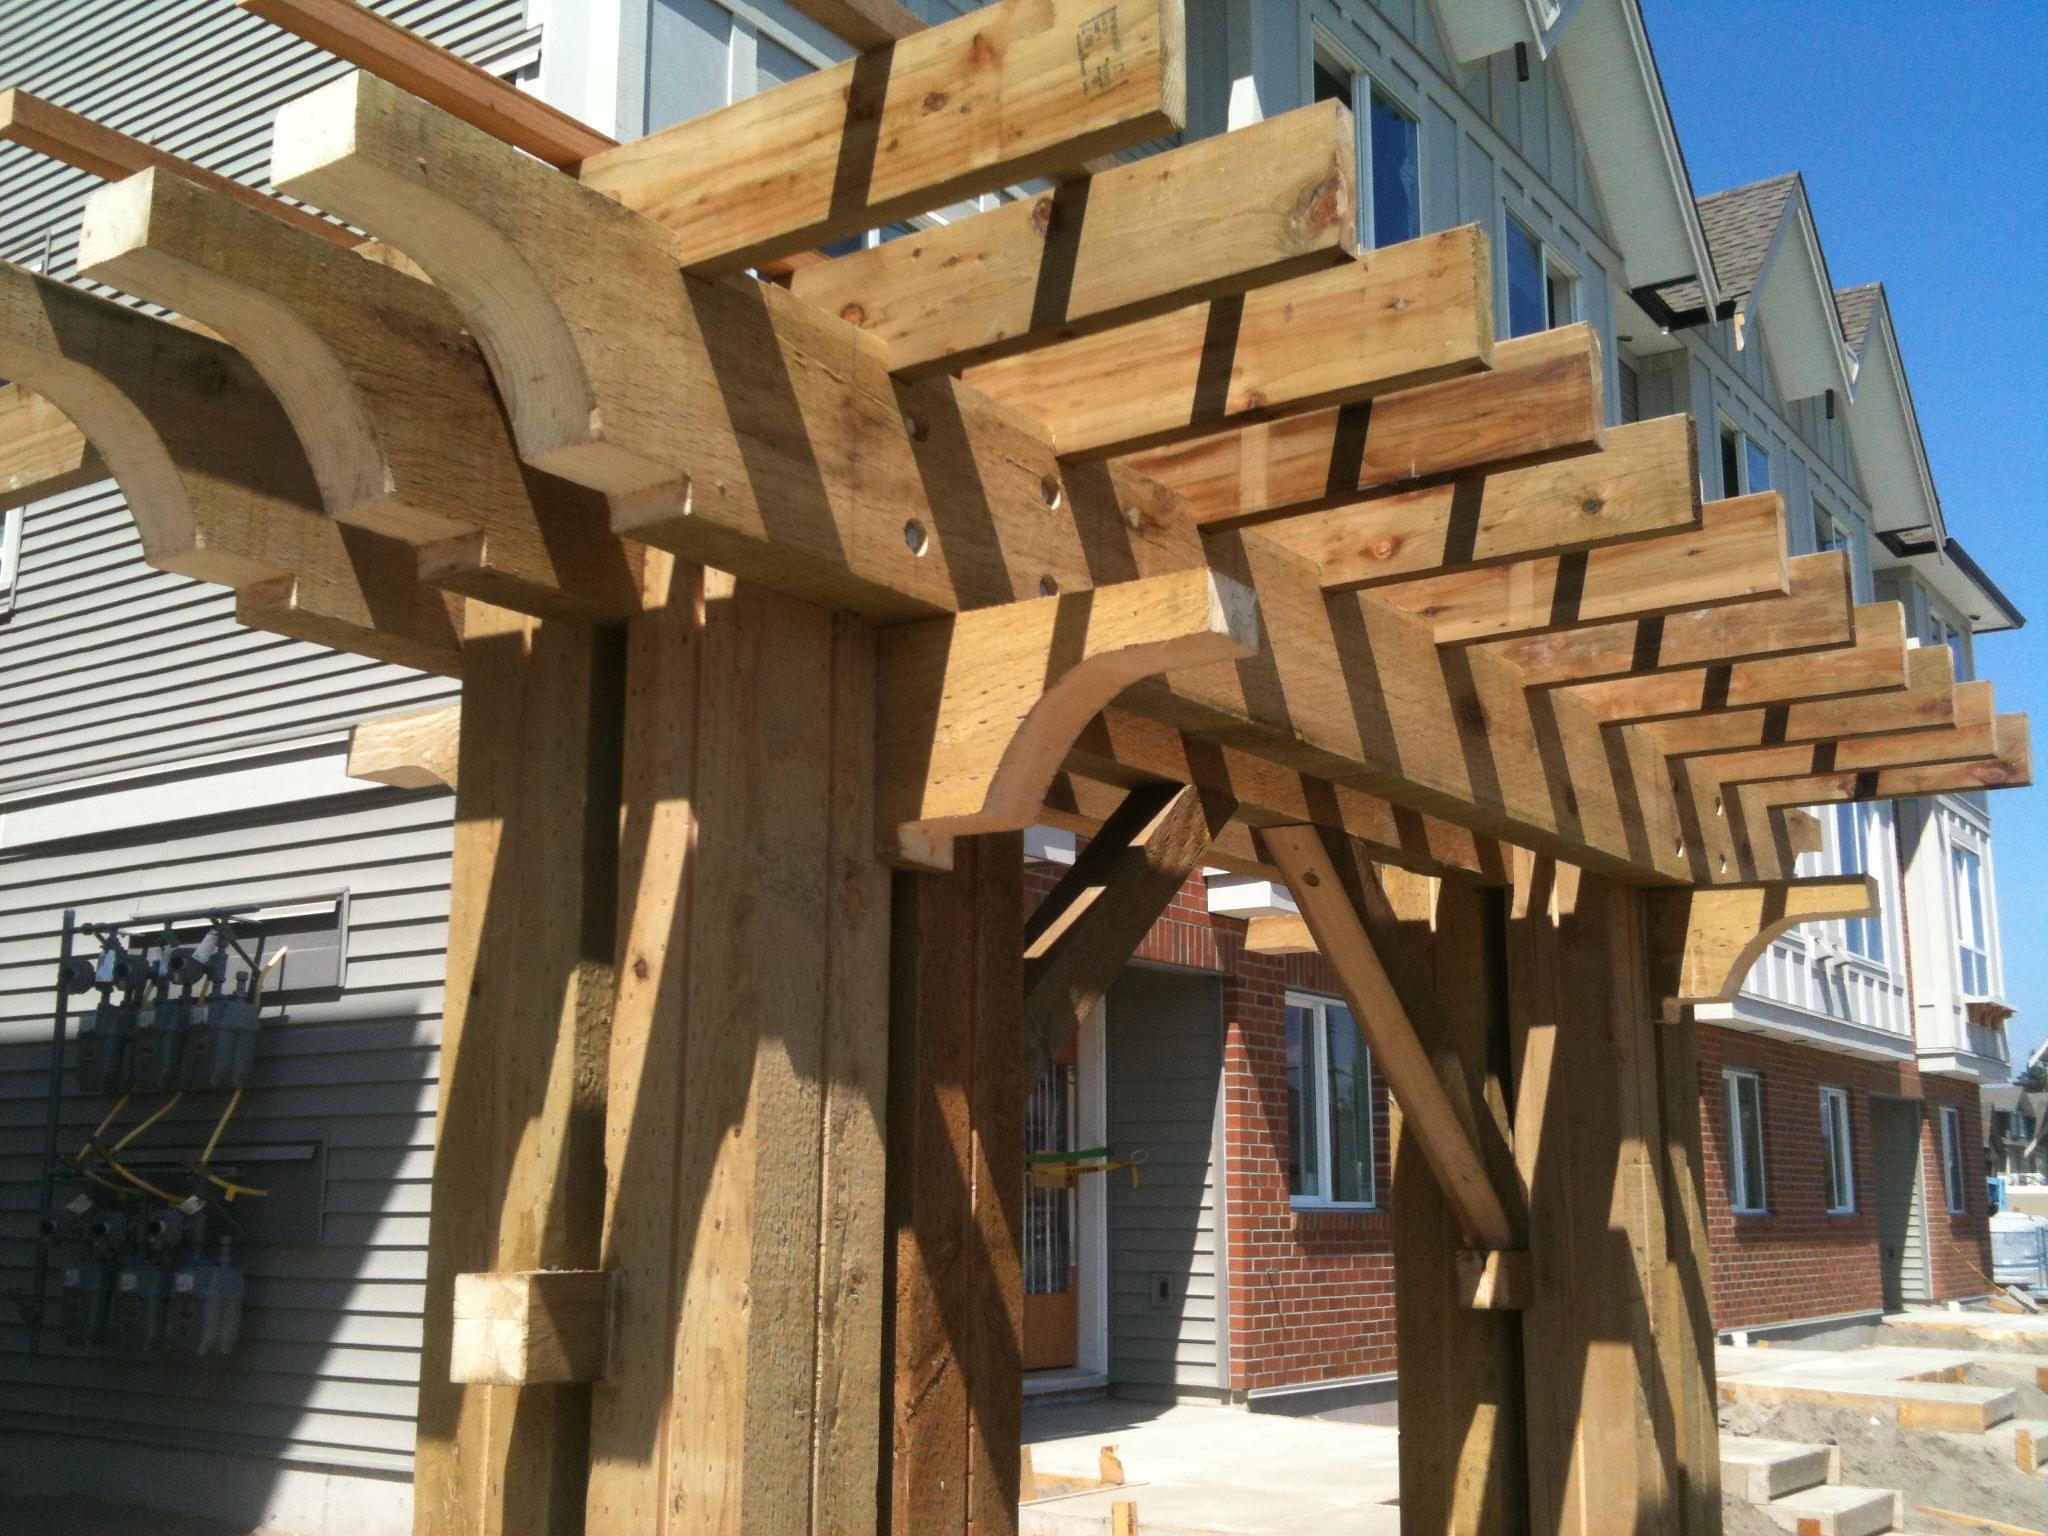 Red Cedar Pergola - Cedar for Building Materials